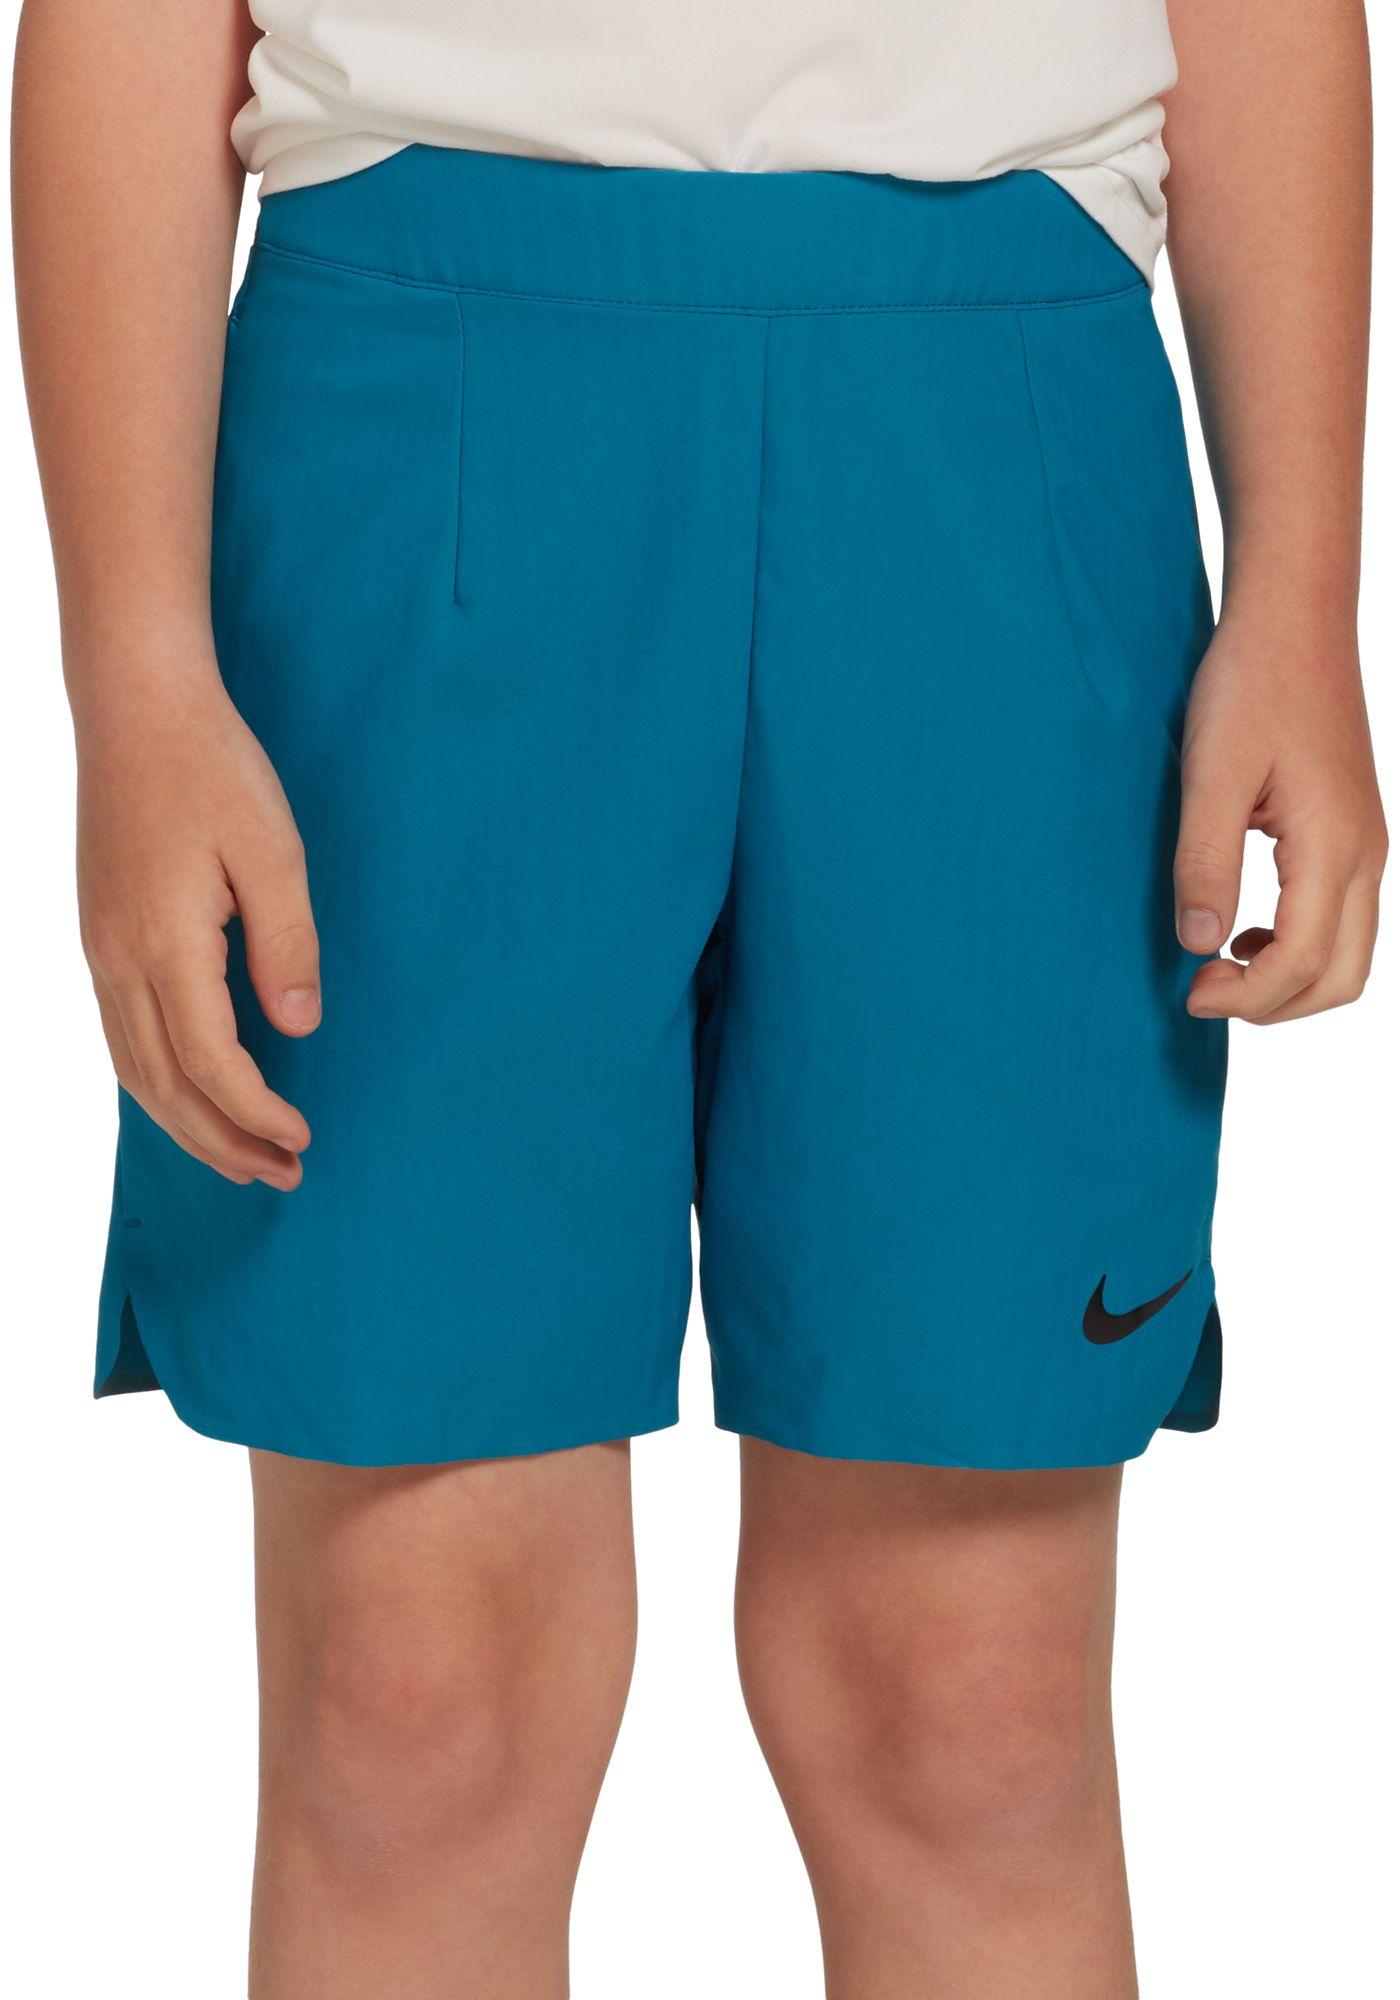 Nike Boys' Court Ace Tennis Shorts